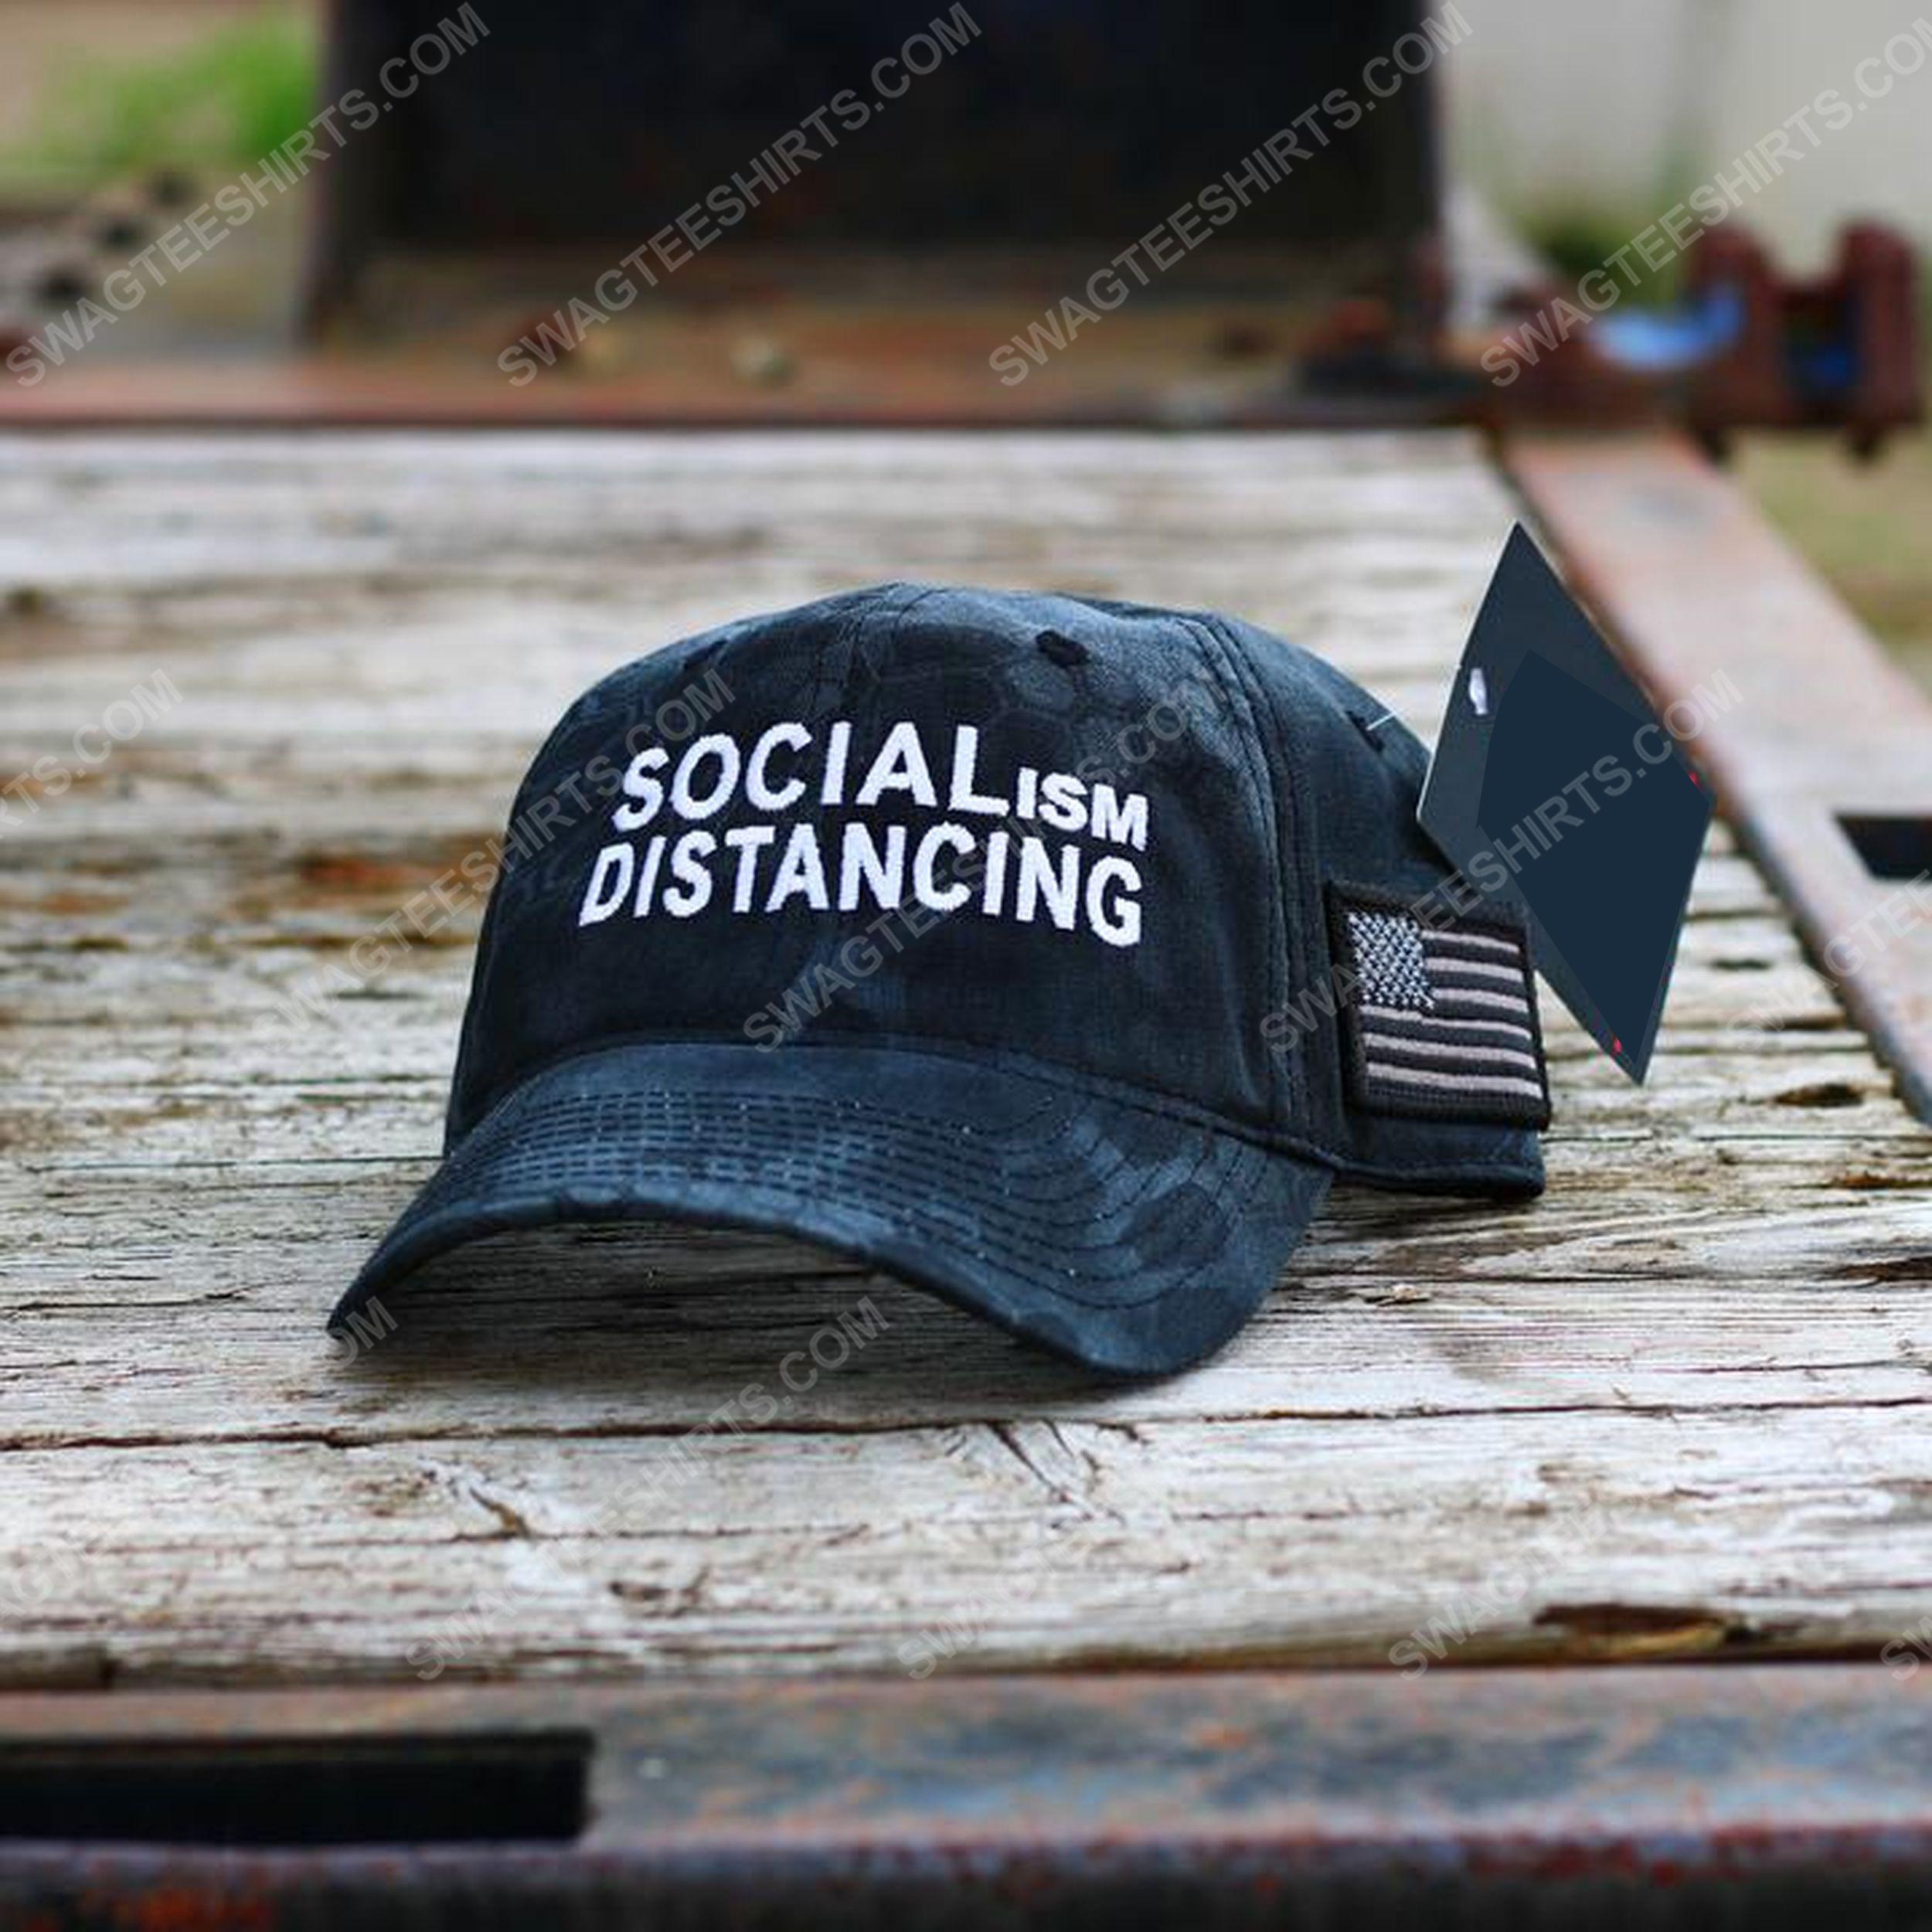 Socialism distancing full print classic hat 1 - Copy